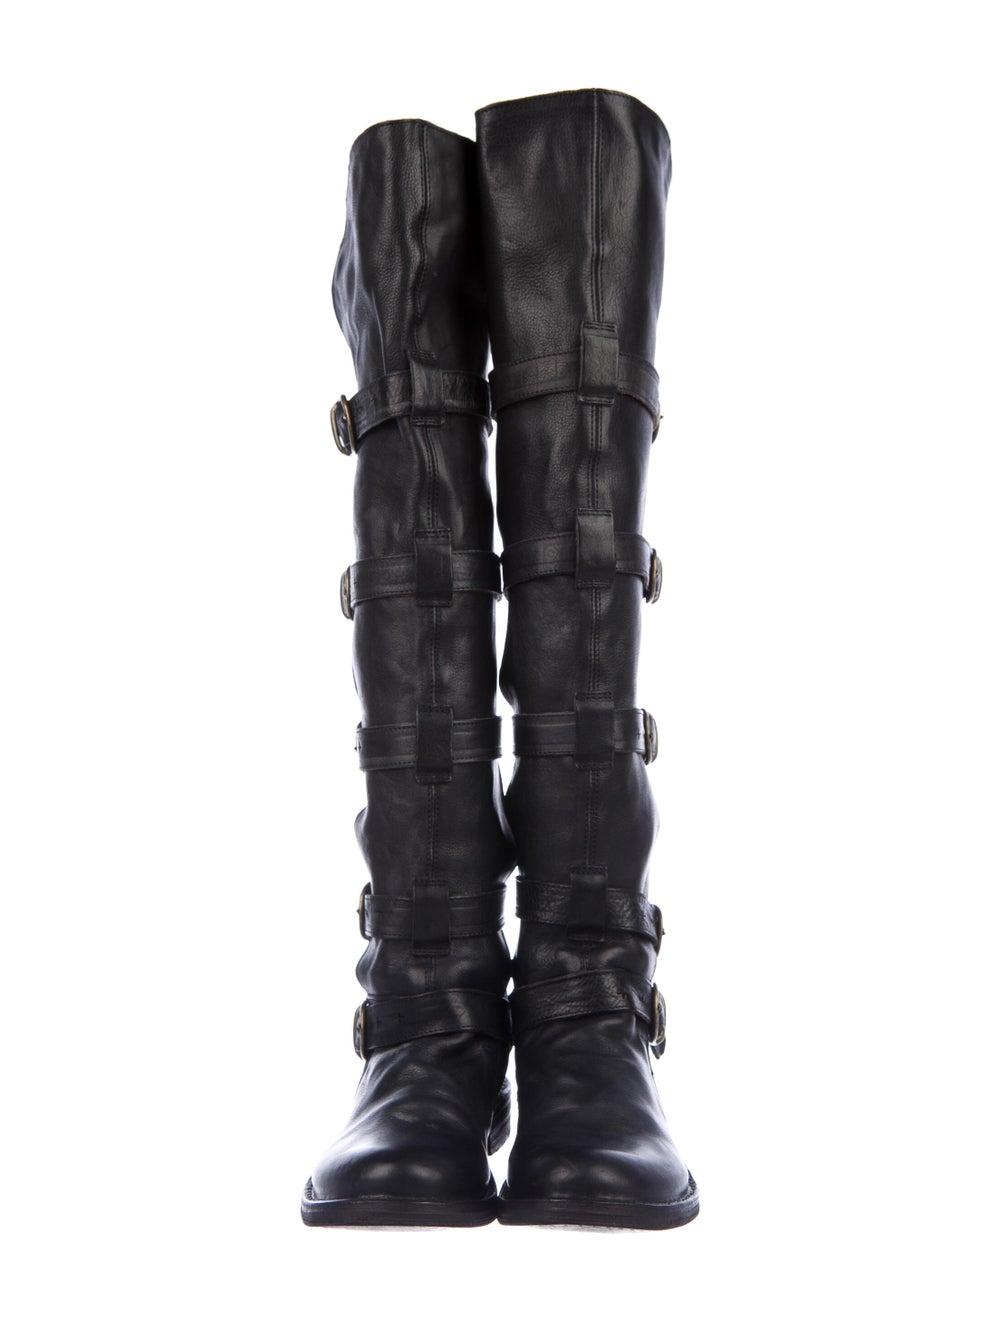 Fiorentini + Baker Leather Combat Boots Black - image 3